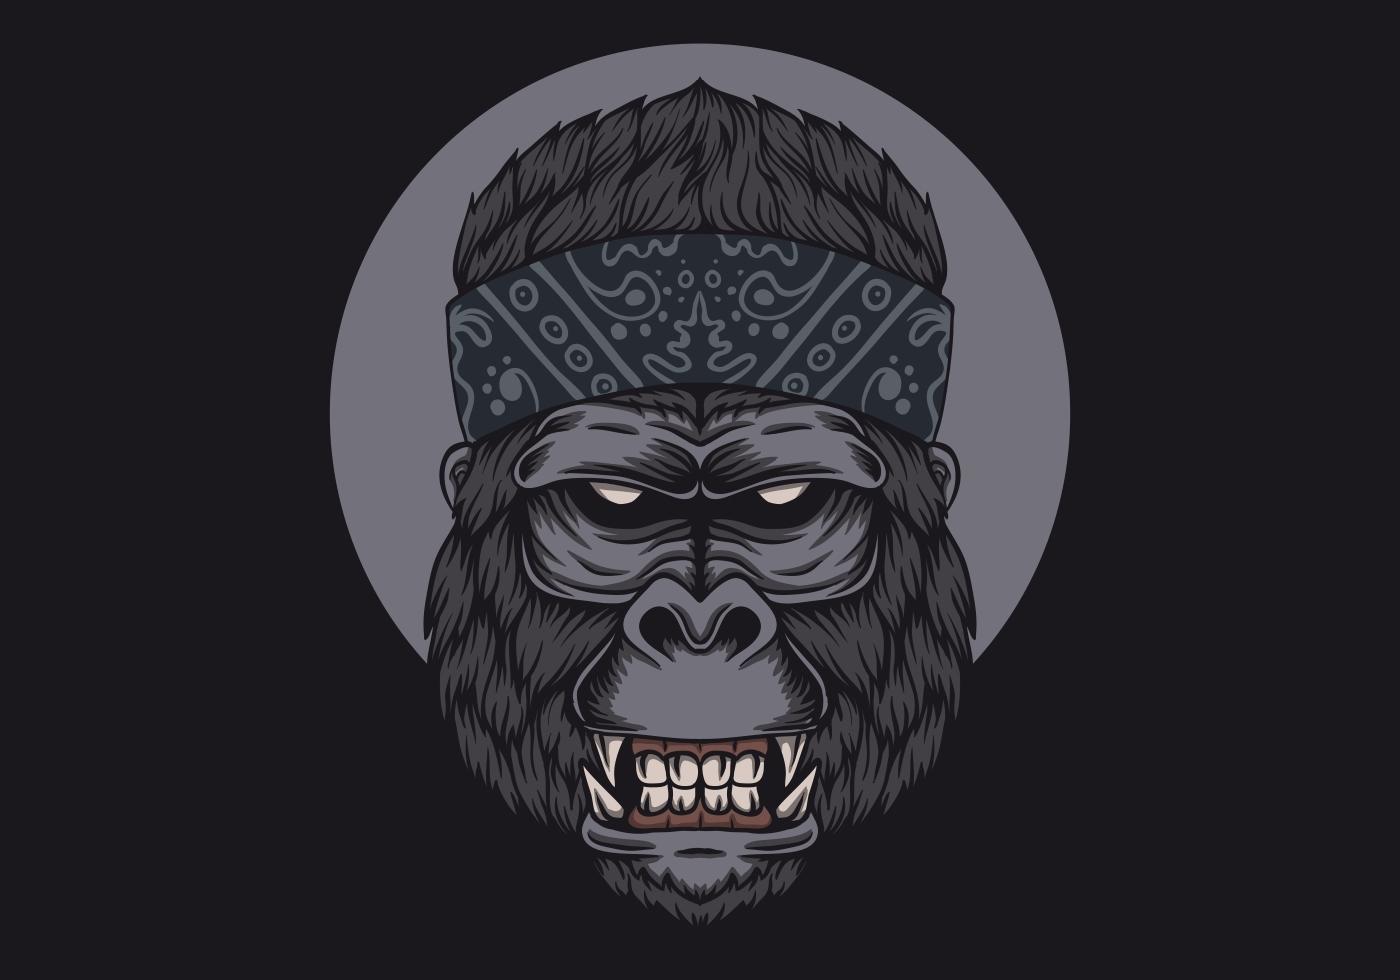 Gorillakopf Bandana vektor